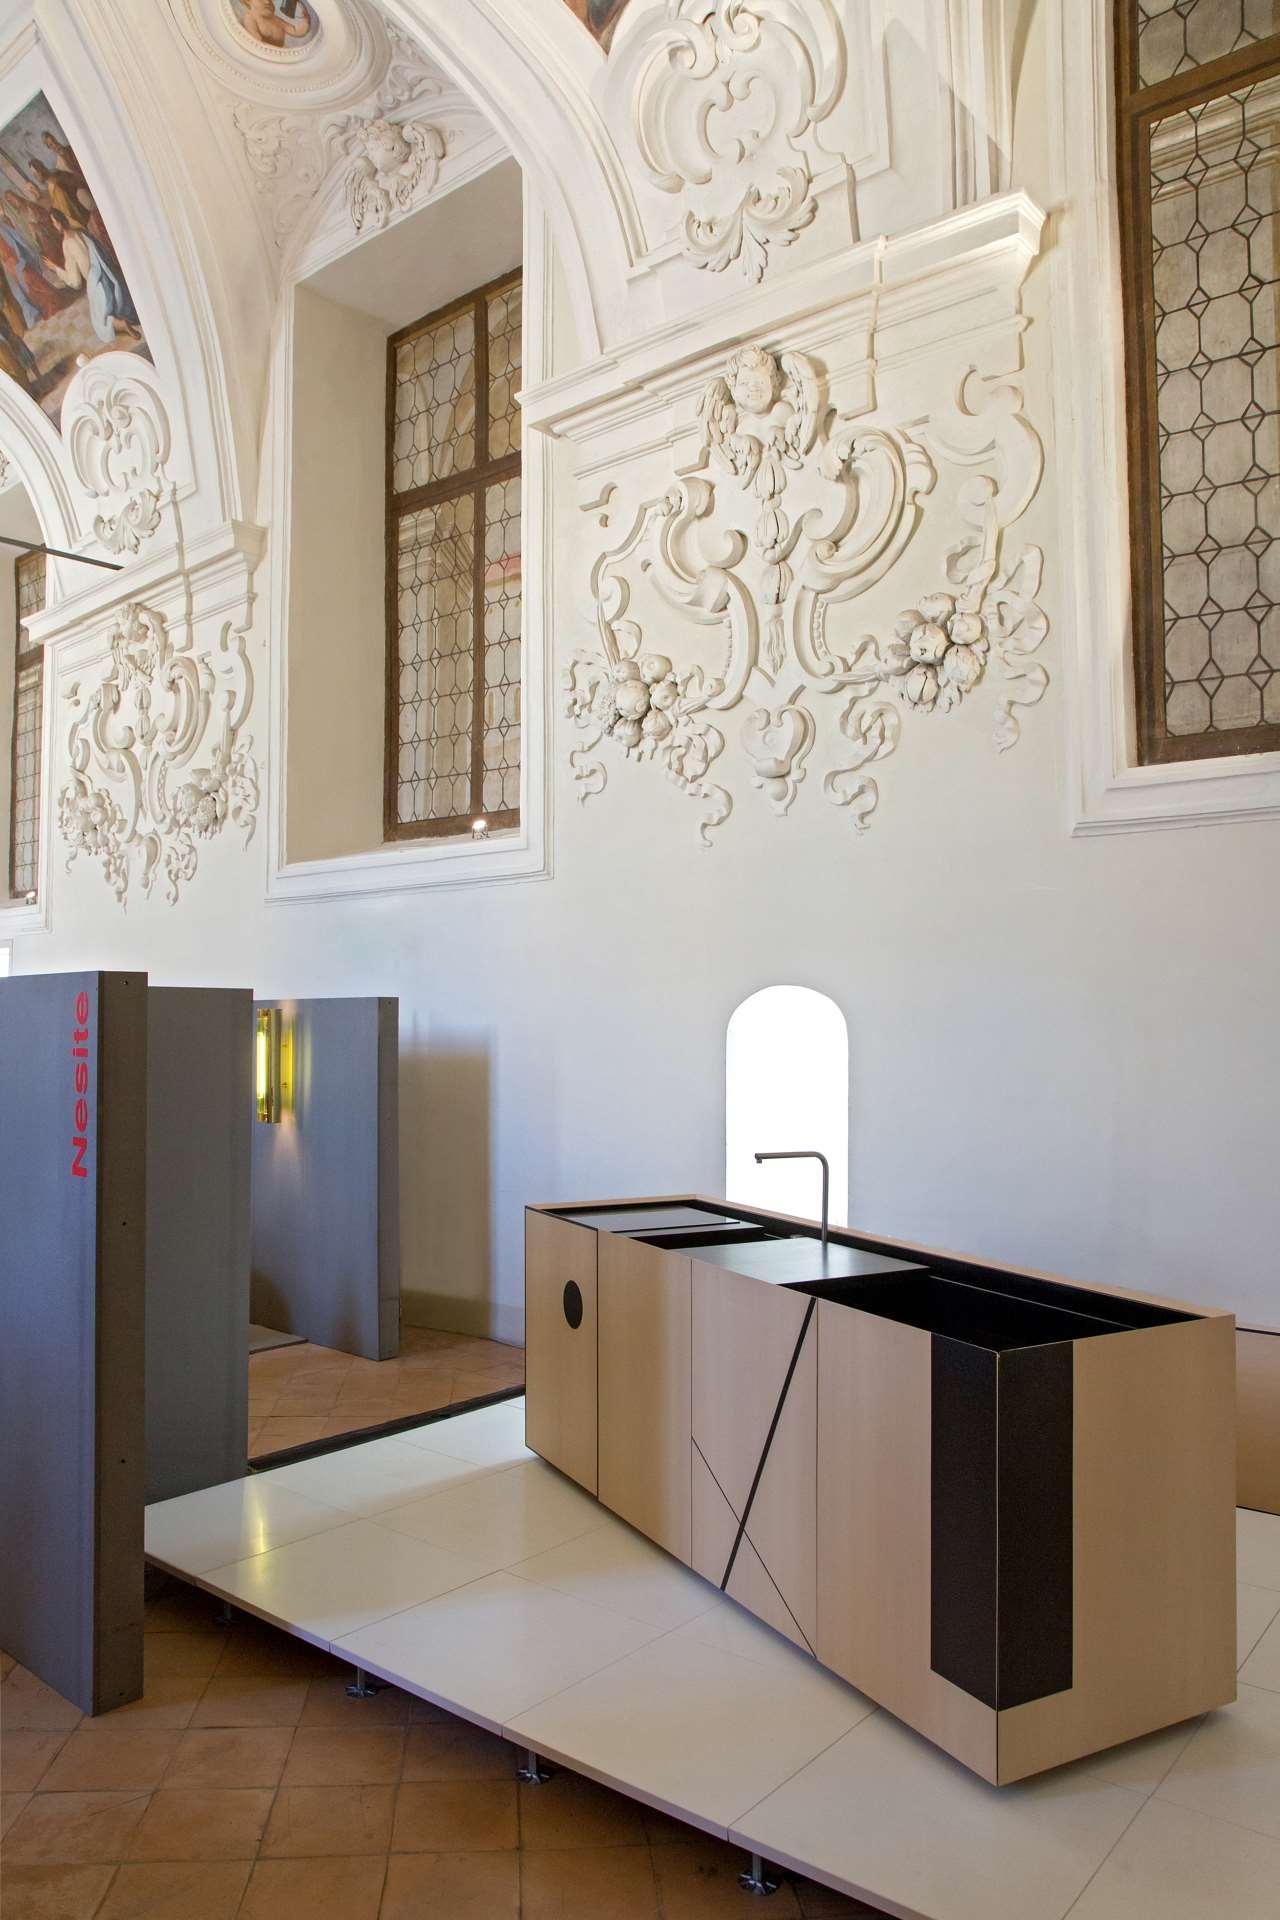 EDIT Napoli exhibition view. Nesite with Elisa Ossino. Photo © Roberto Pierucci.